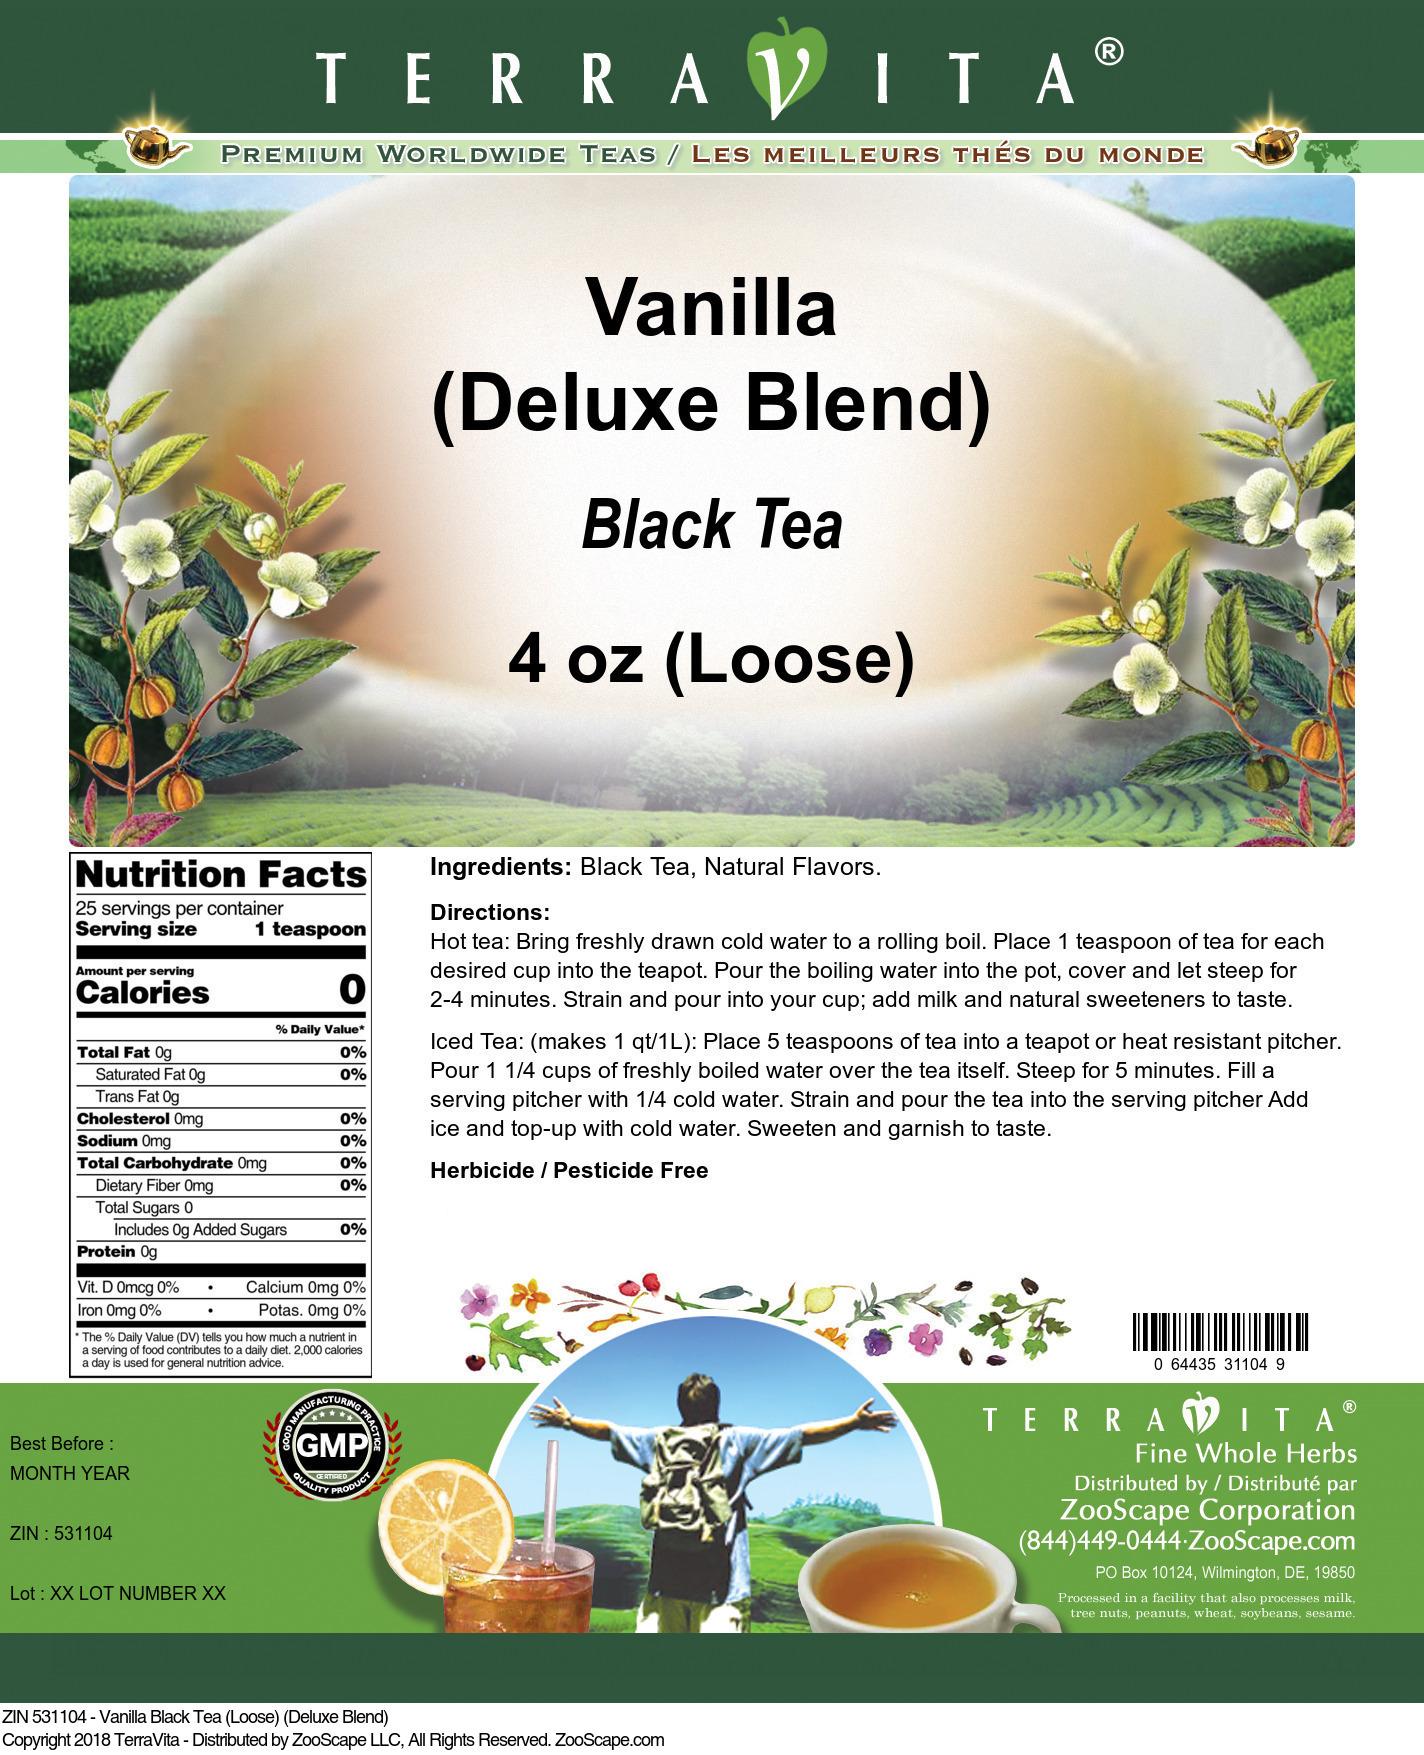 Vanilla Black Tea (Loose) (Deluxe Blend)